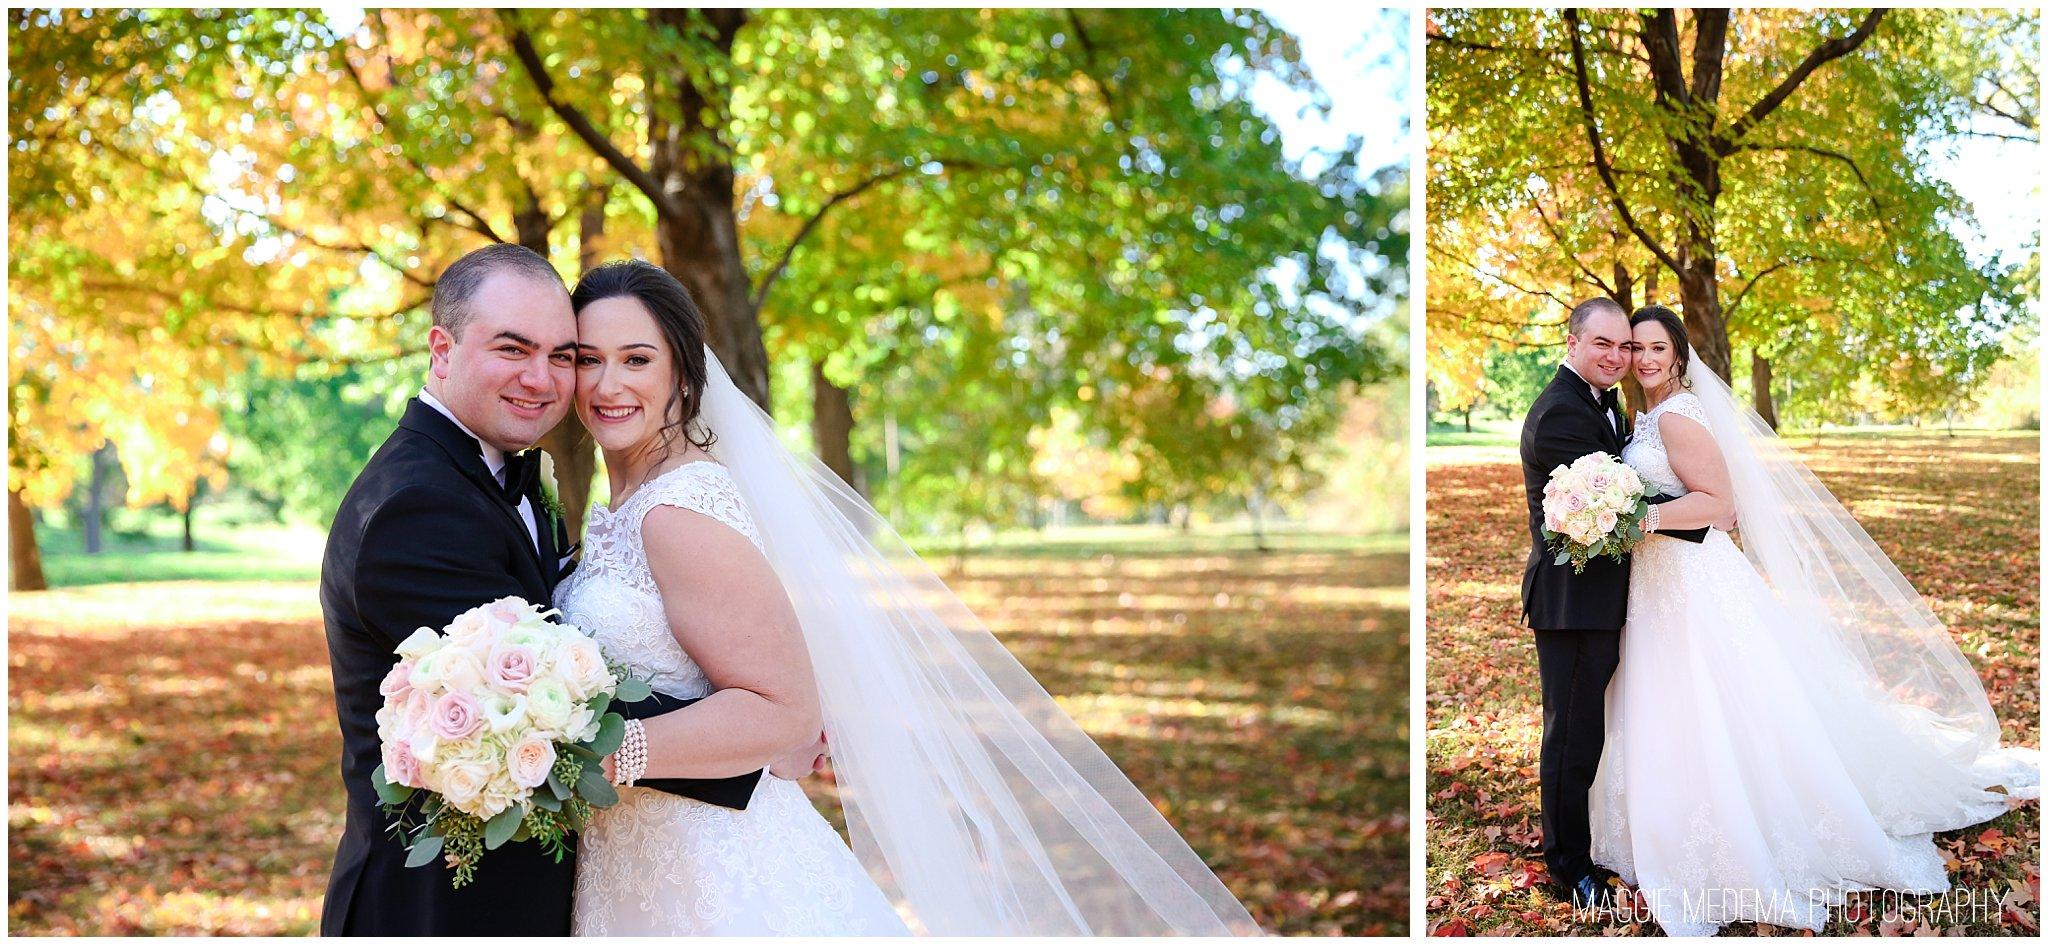 St. Louis Forest Park Wedding Photos